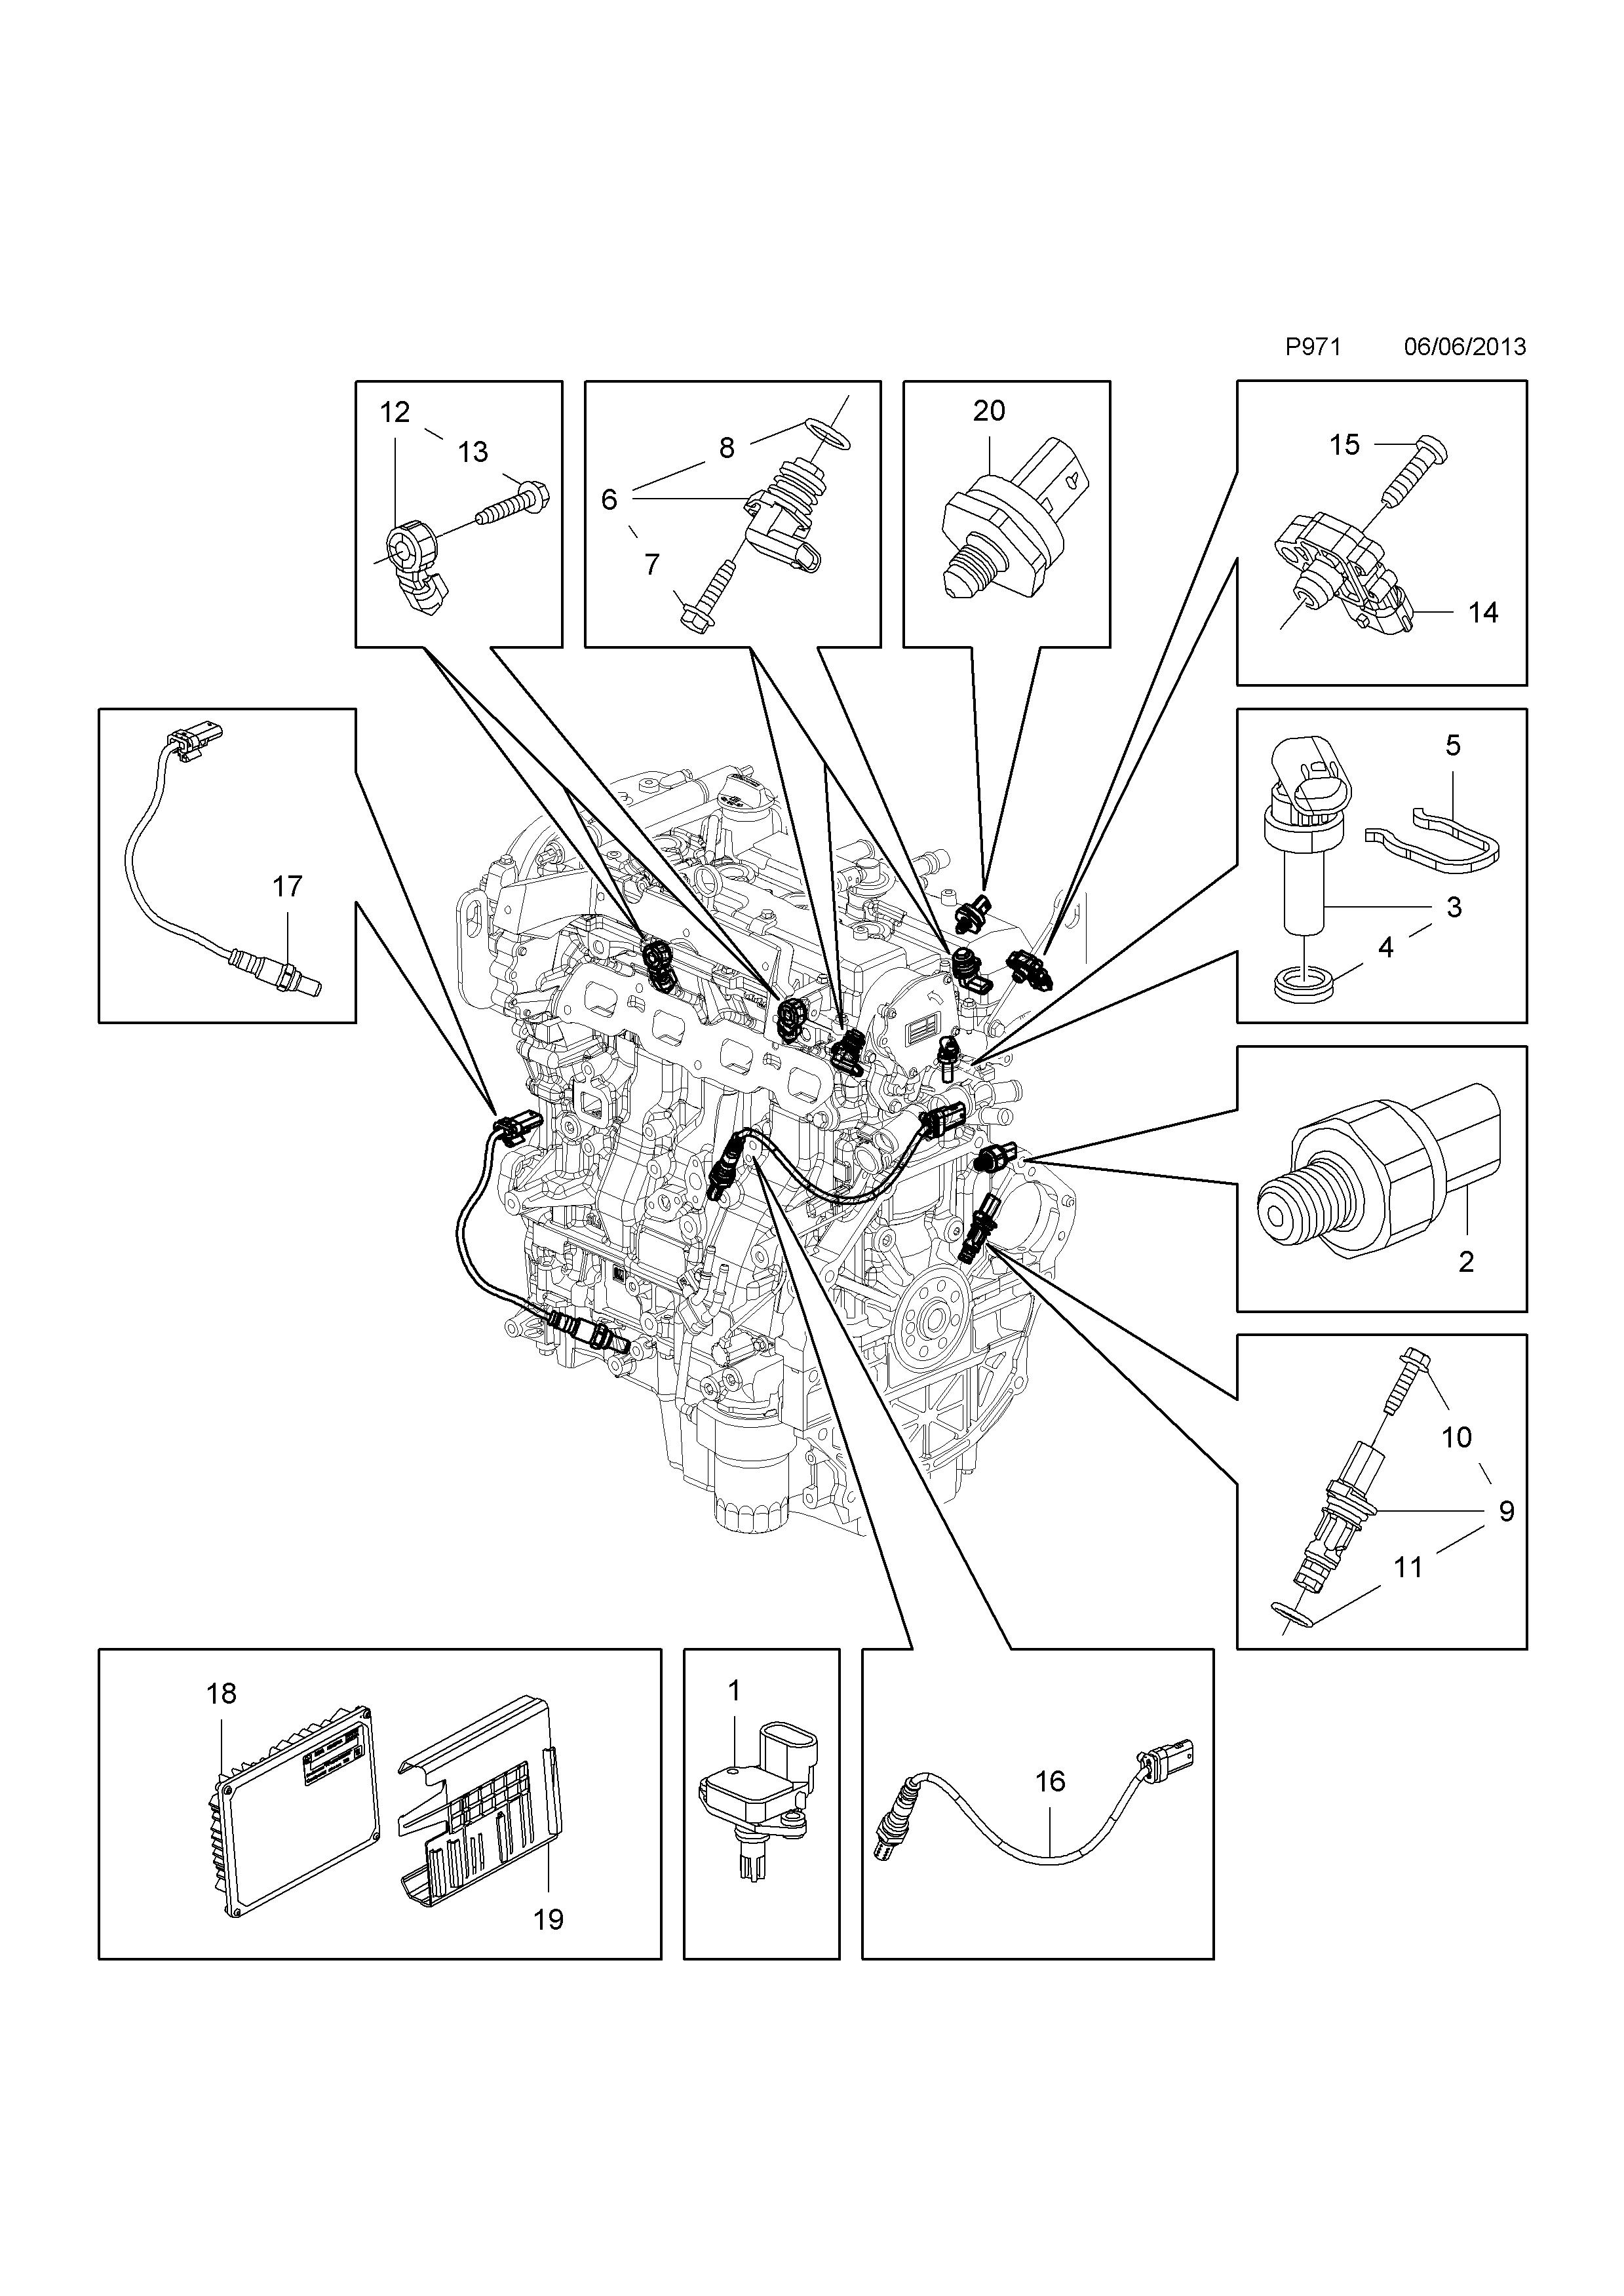 Astonishing Vauxhall Fuel Pressure Diagram Circuit Diagram Template Wiring Cloud Nuvitbieswglorg